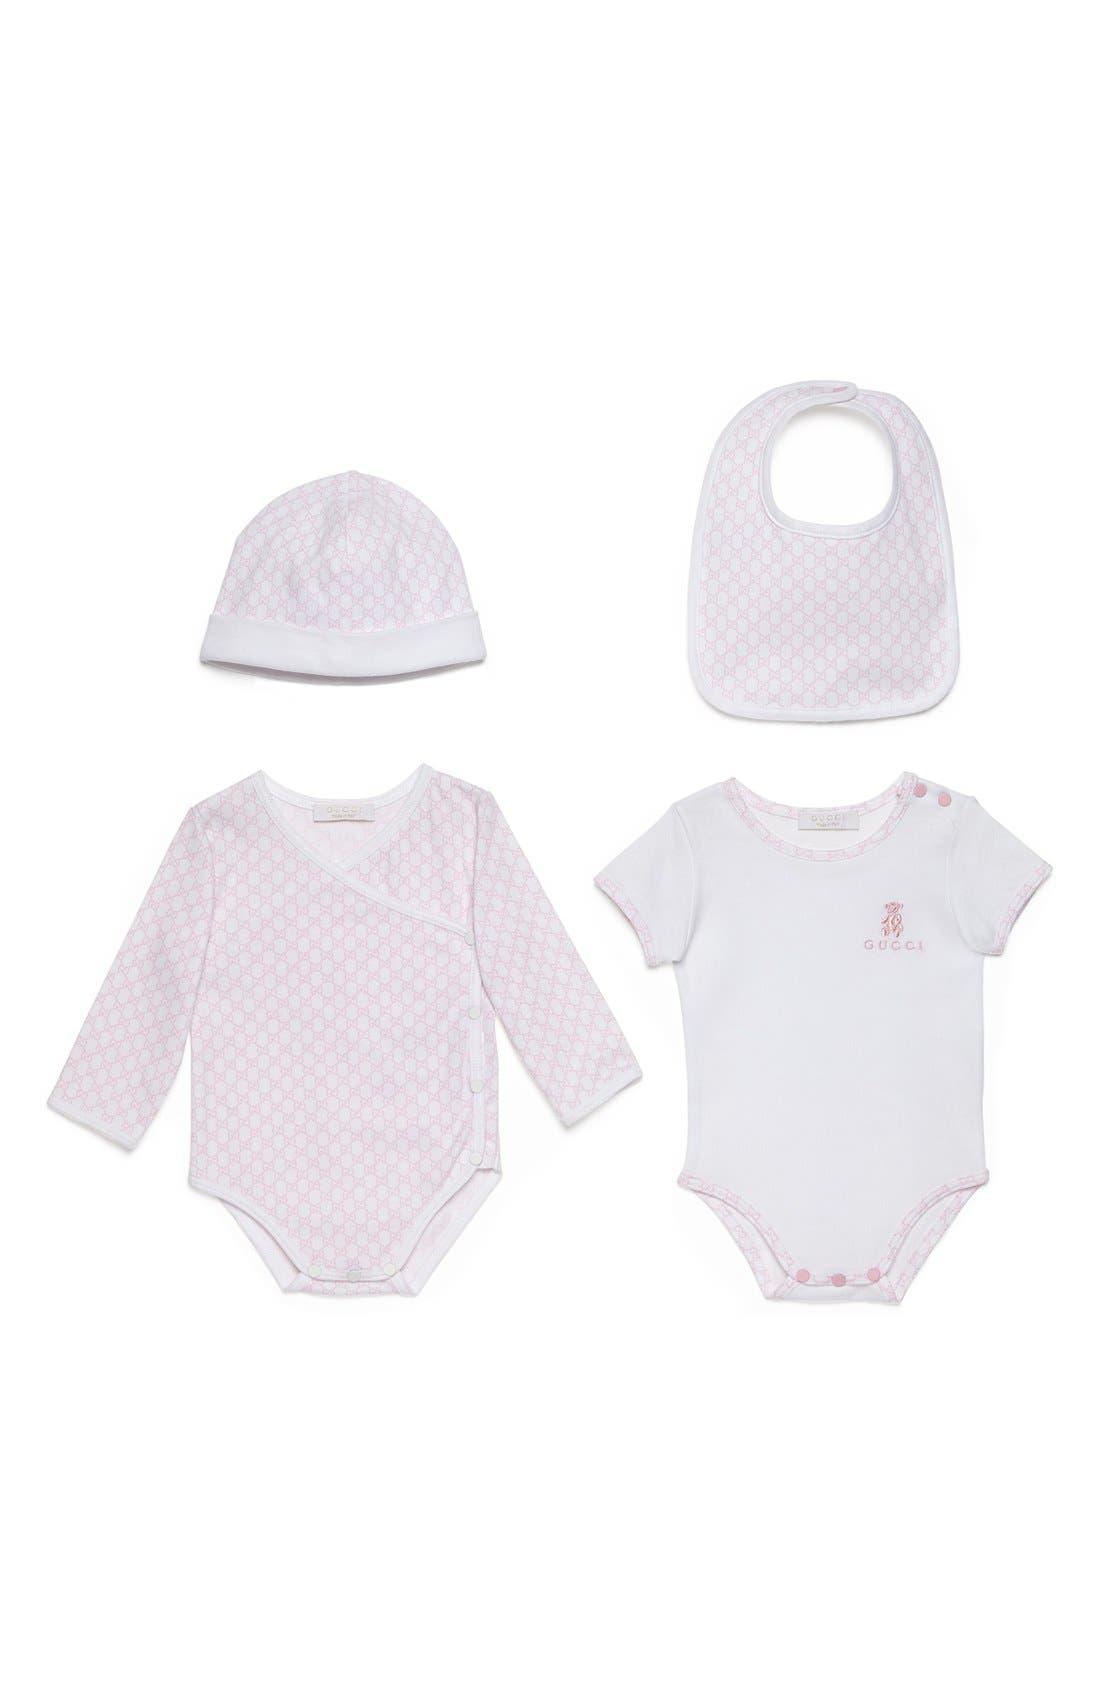 Gucci Short Sleeve Bodysuit, Long Sleeve Bodysuit, Hat & Bib Set (Baby)